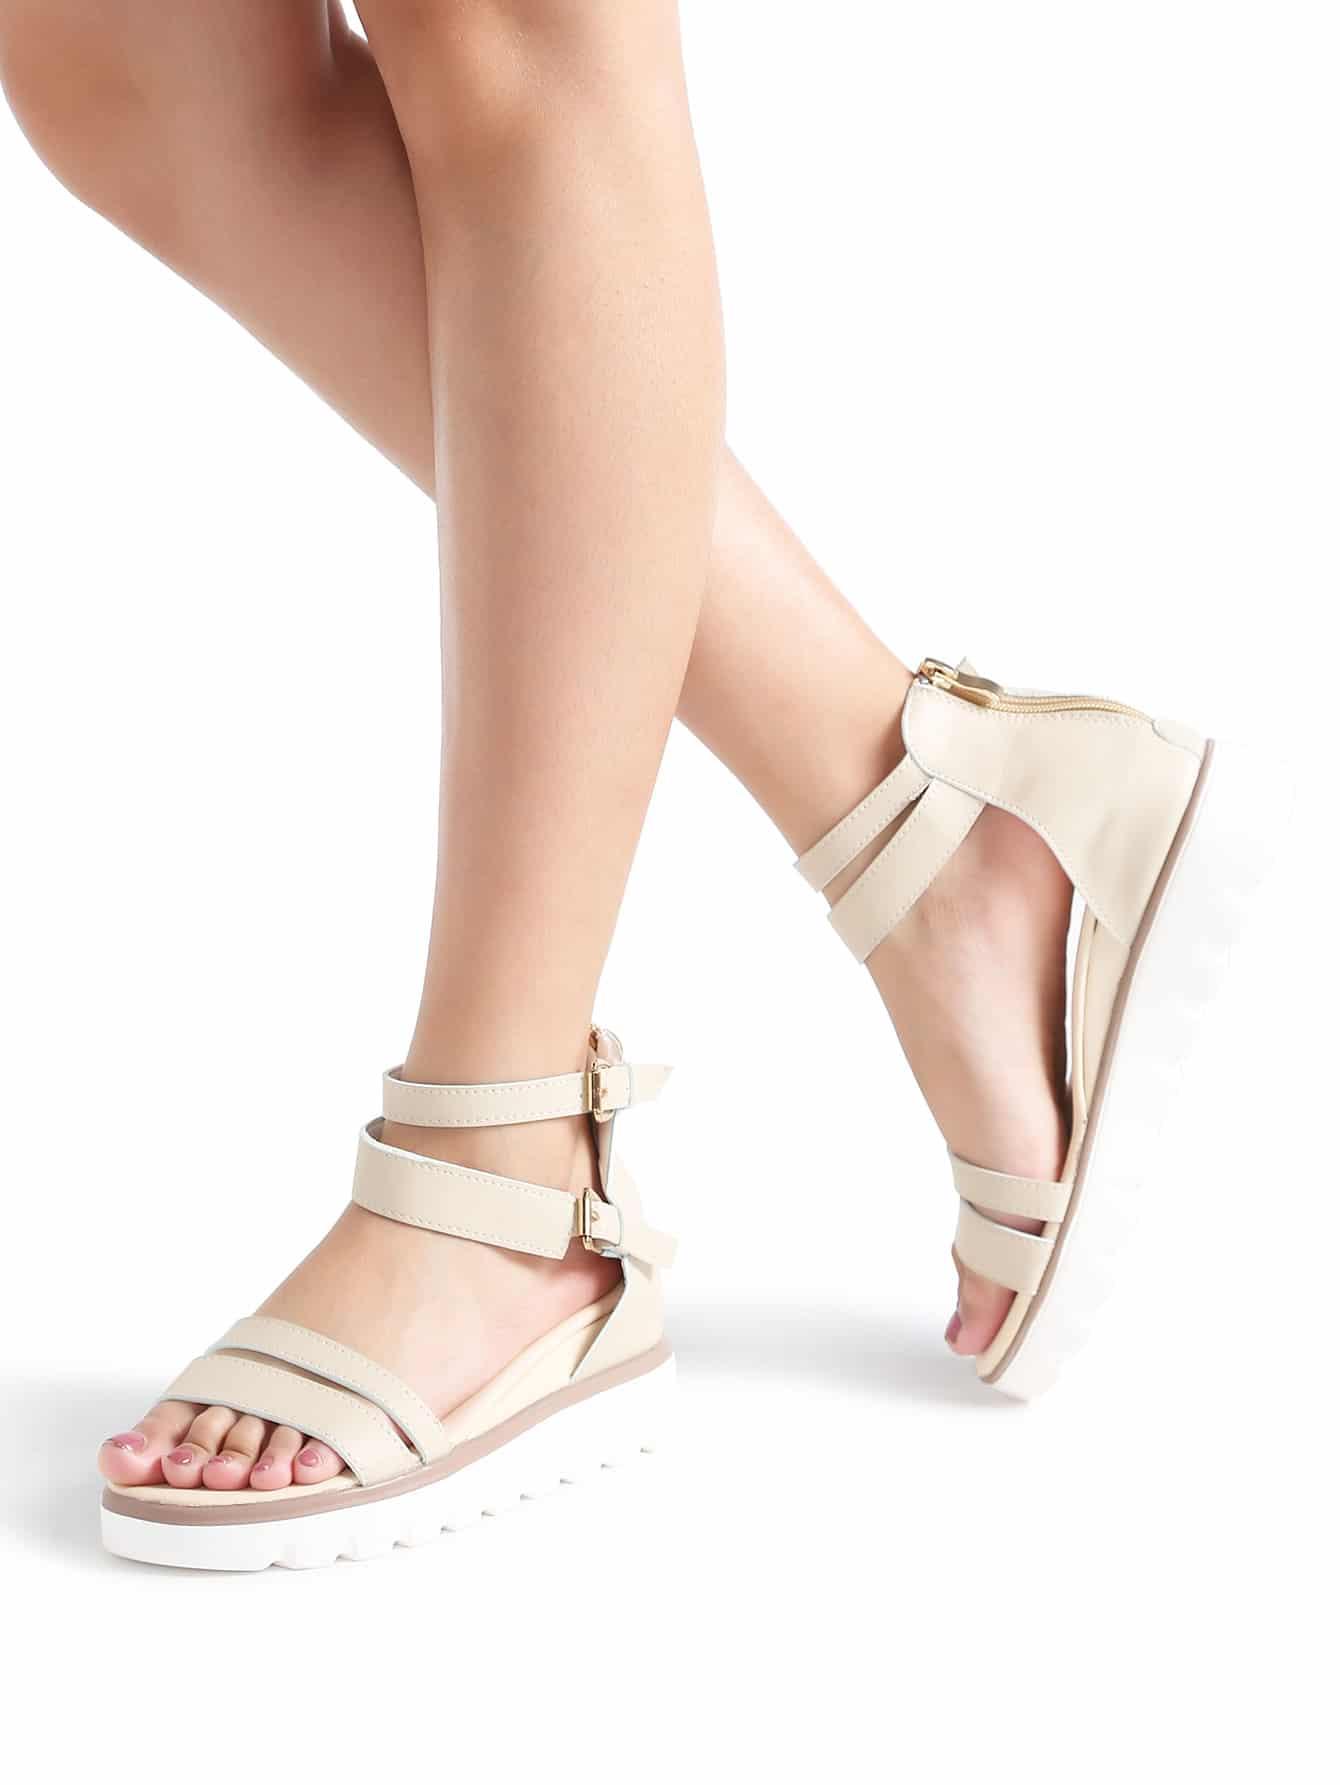 Apricot Strappy Zipper Back Flatform Sandals shoes170320806